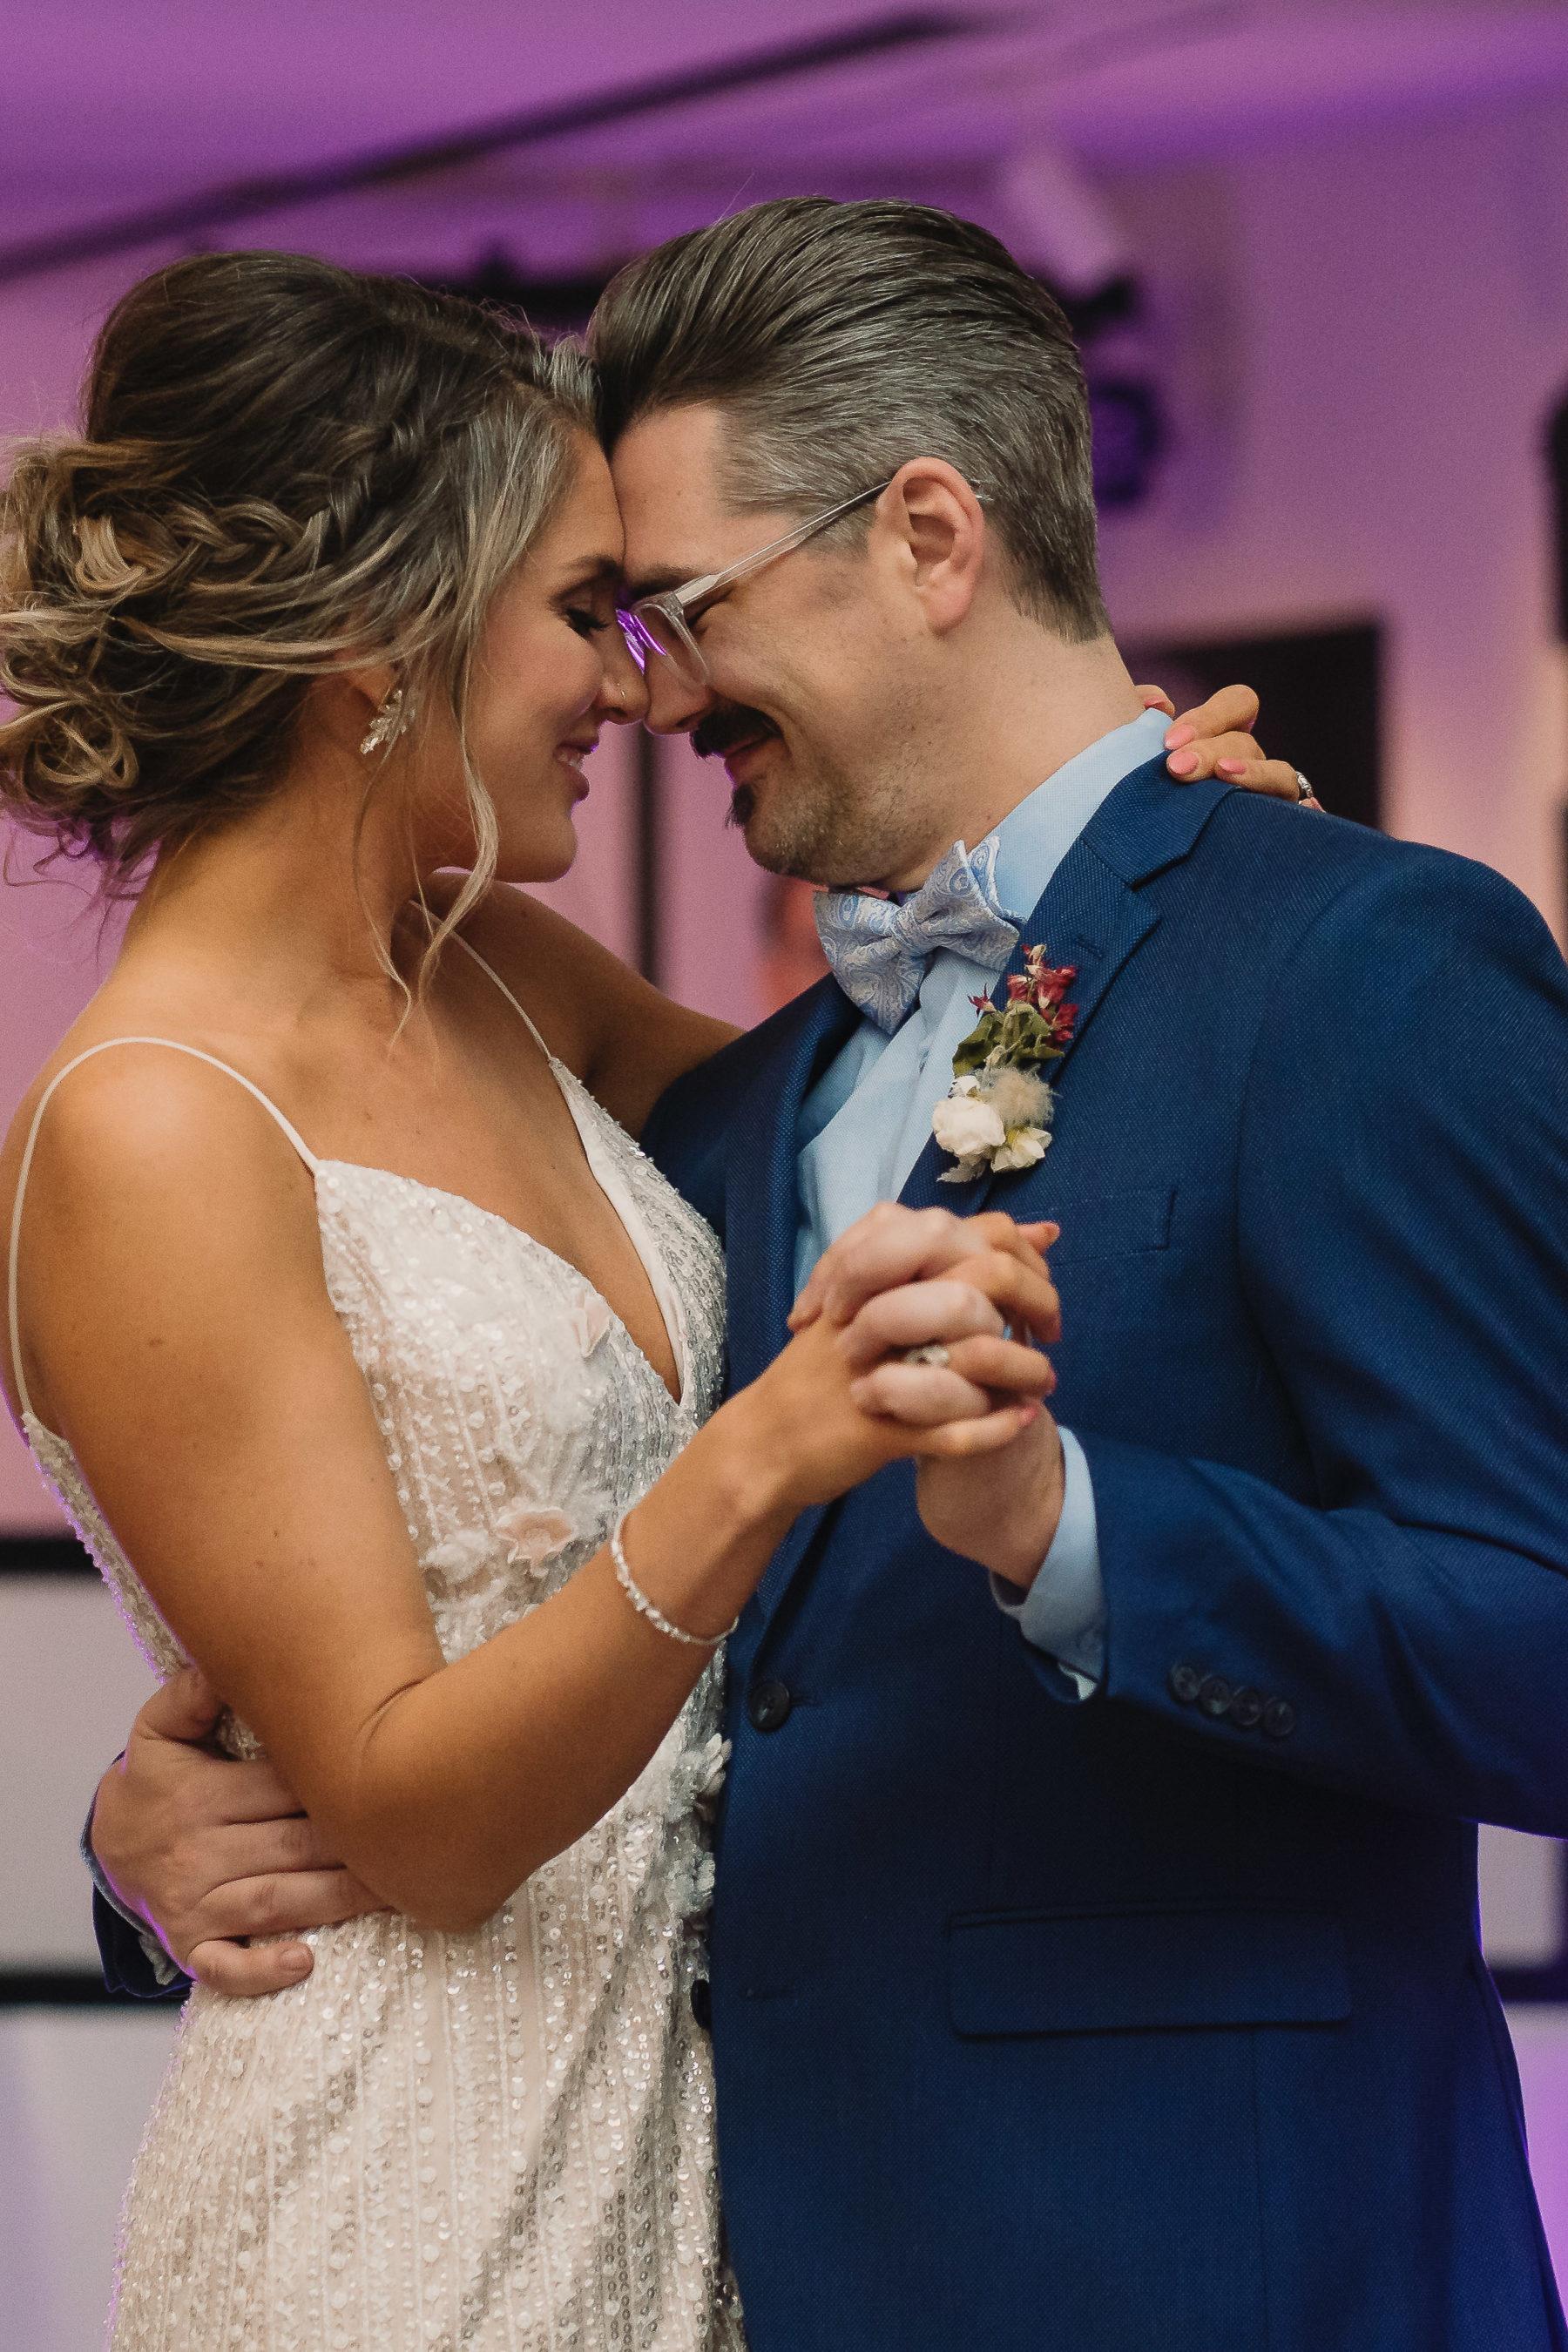 The Nashville Big Fake Wedding captured by Charlene Mann Photography